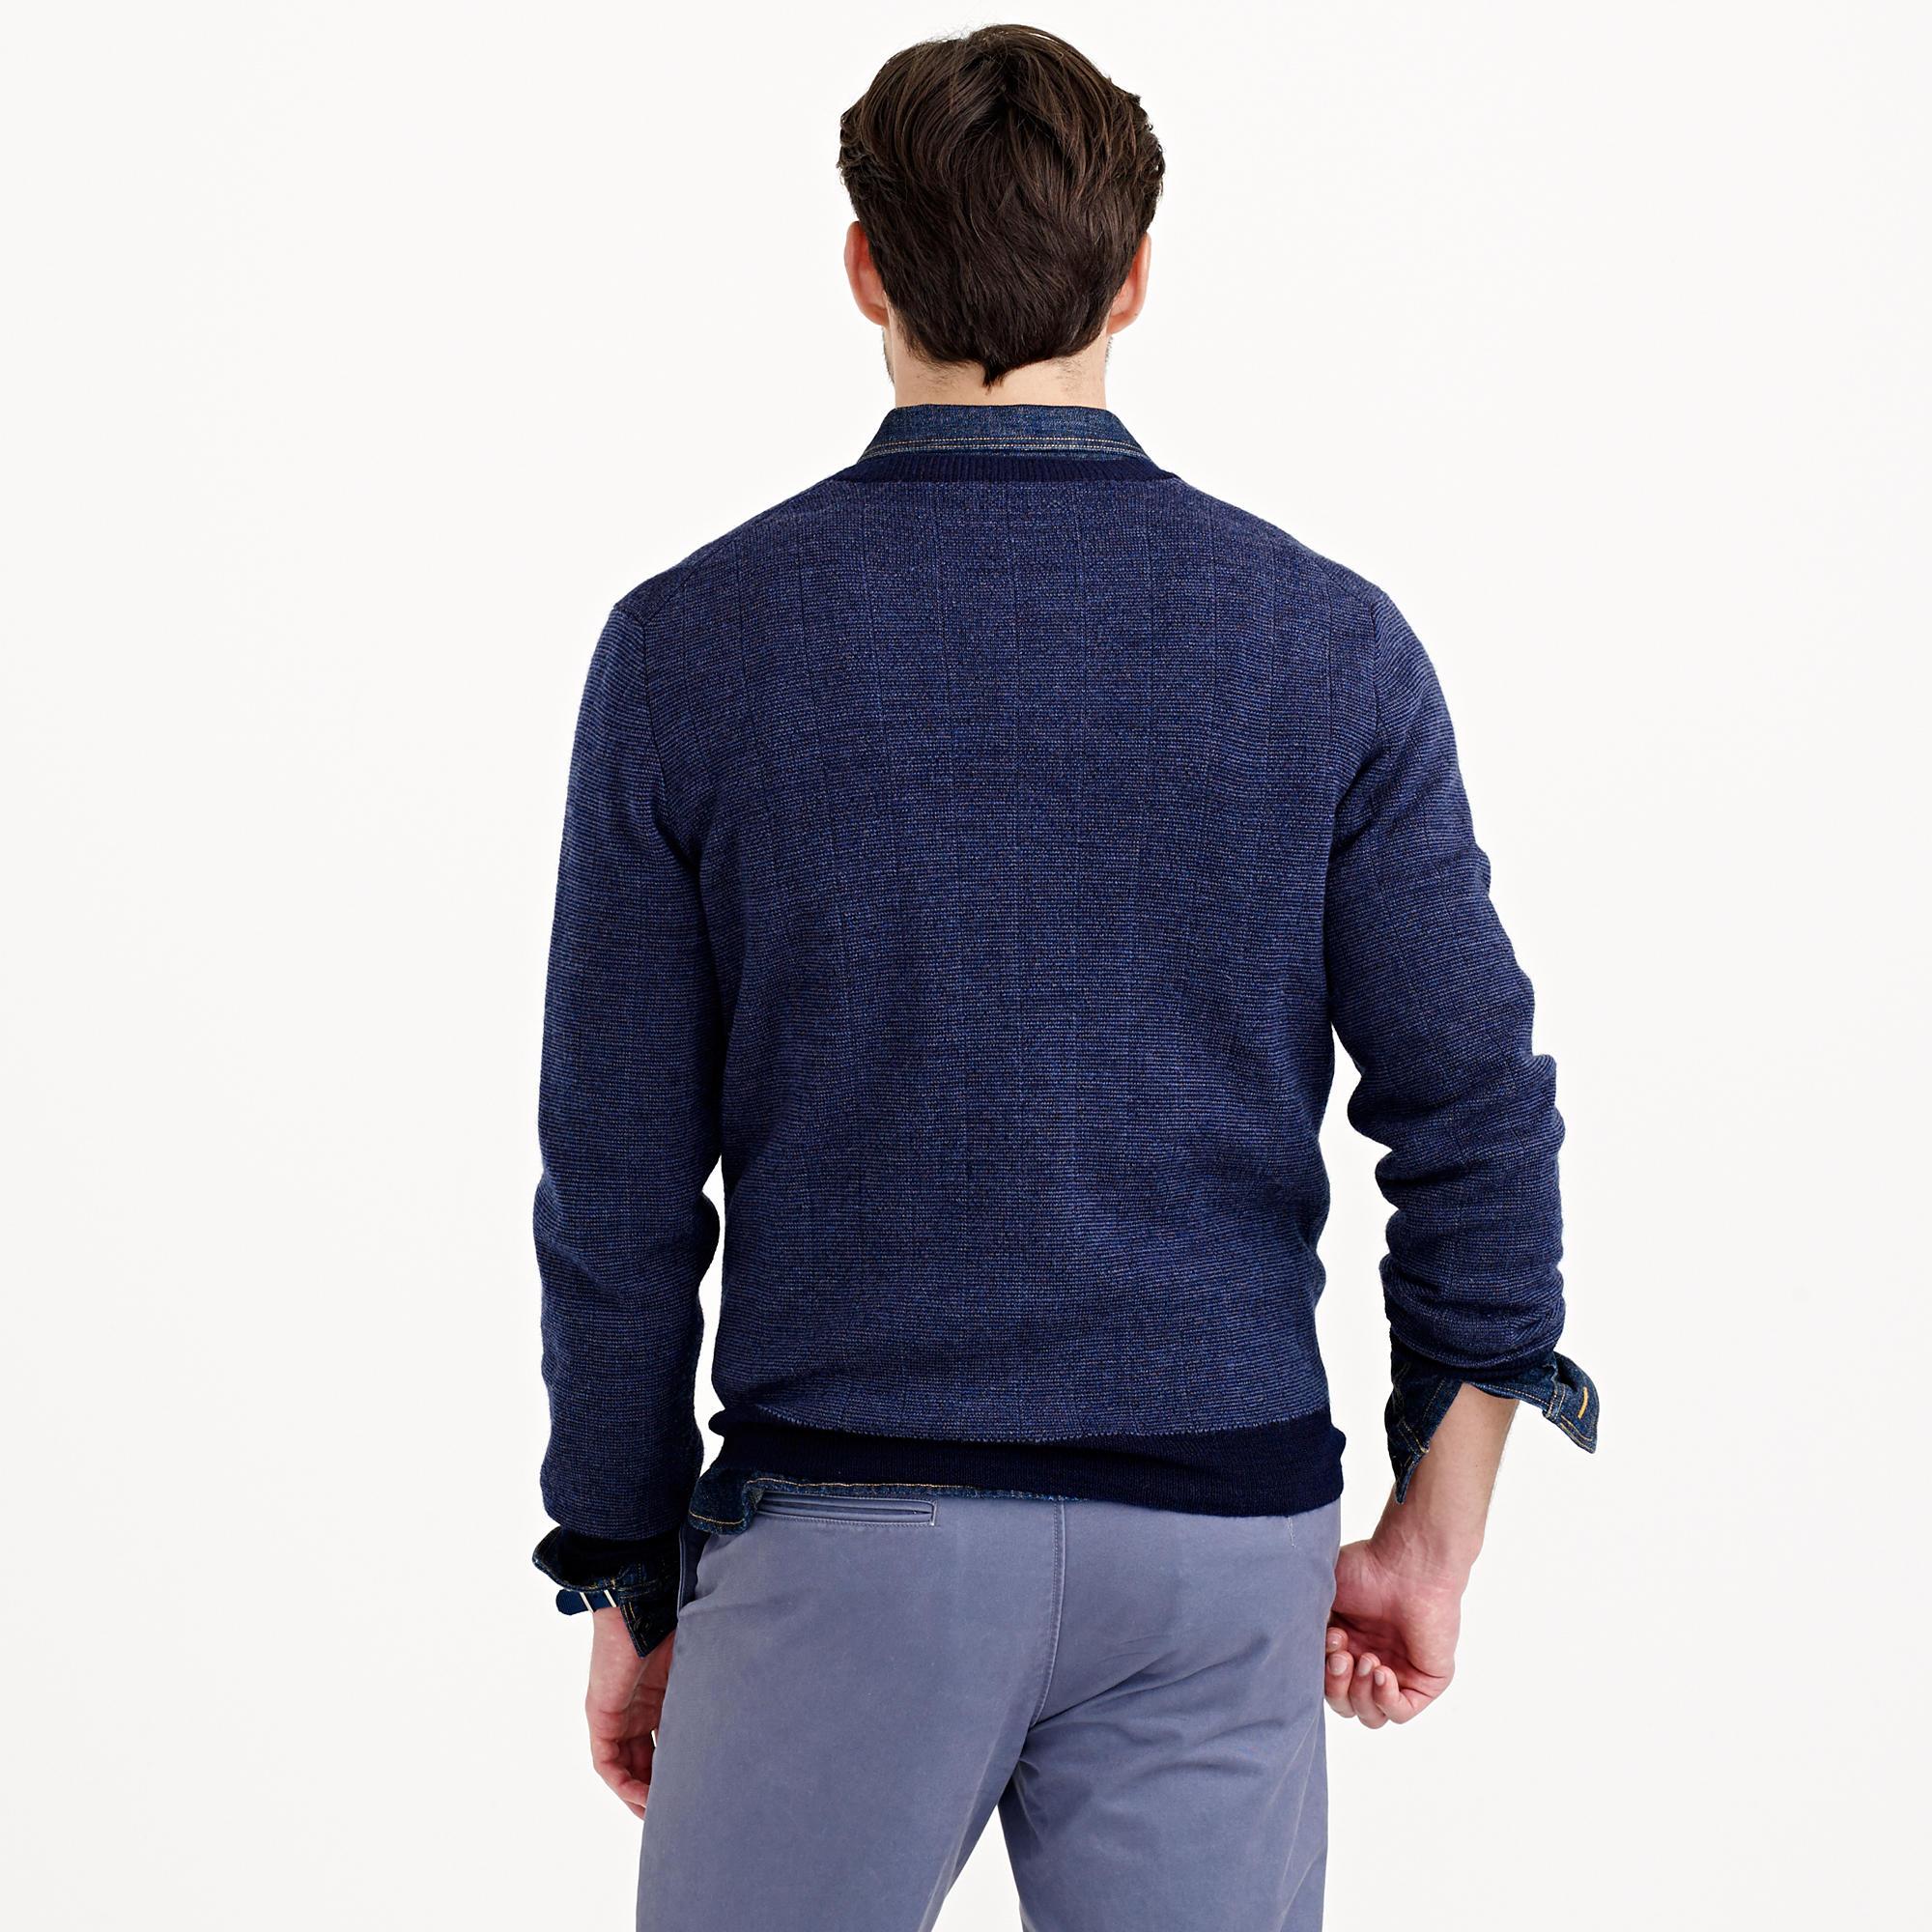 J.crew Wallace & Barnes Zip Cardigan Sweater In Blue For